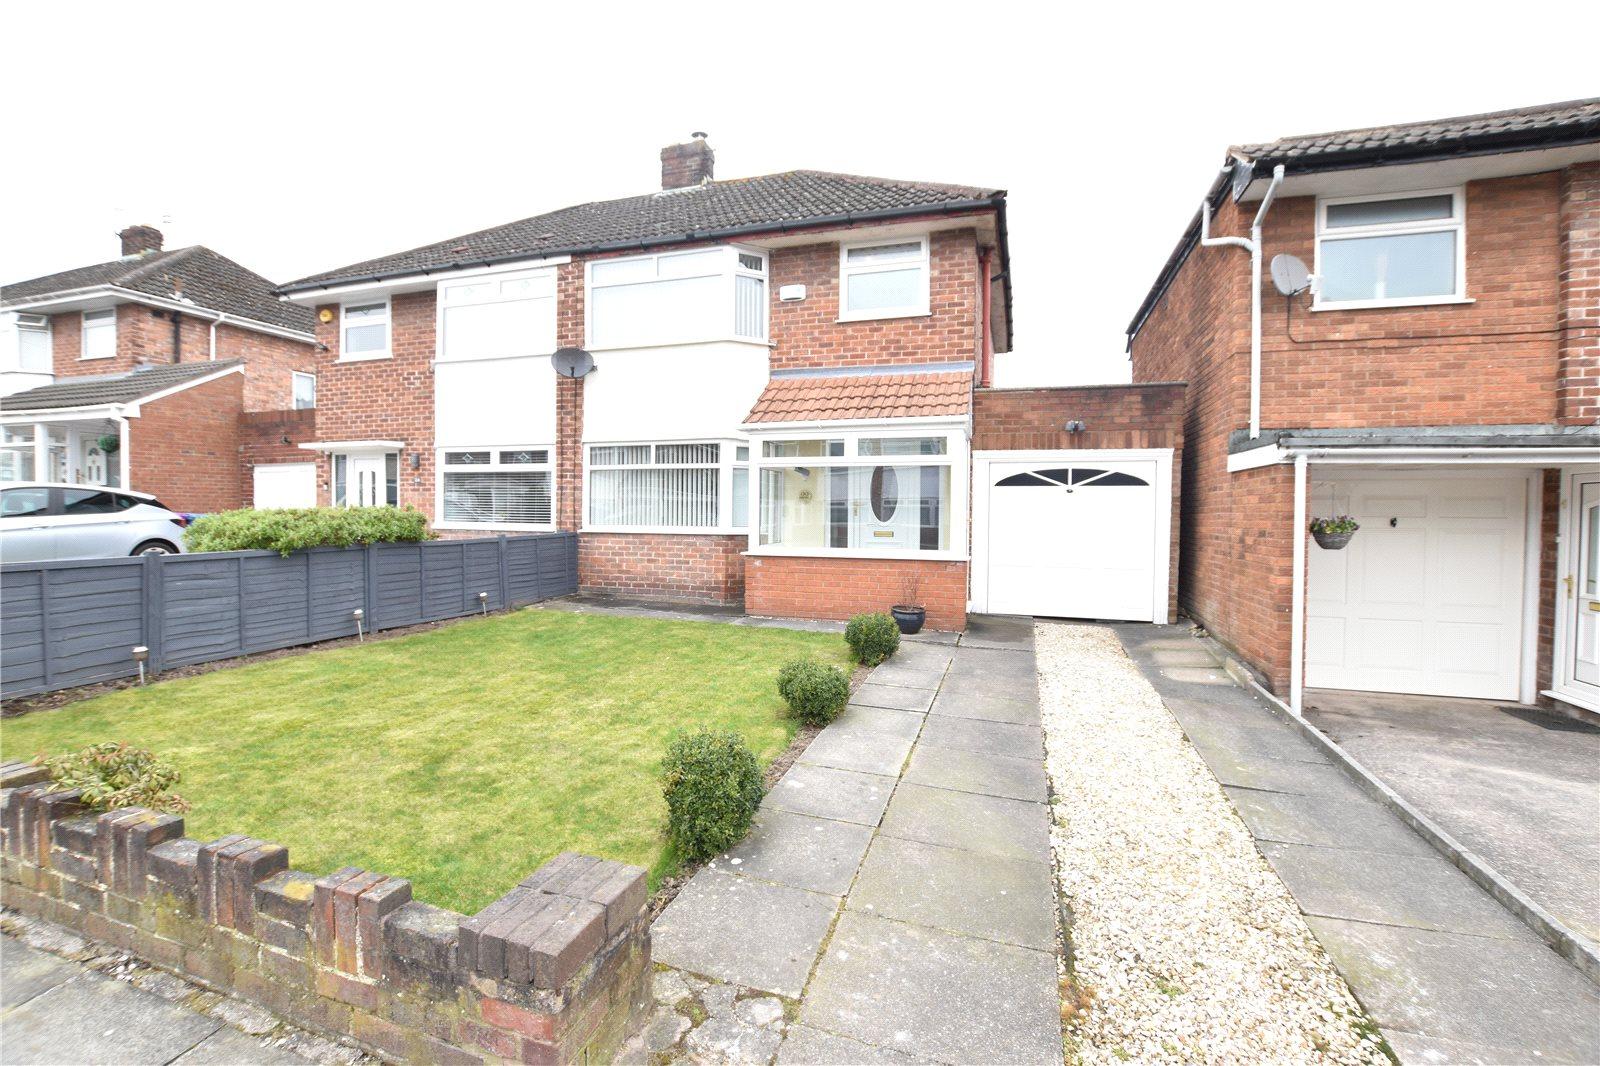 Stonyhurst Road, Woolton, Liverpool, L25 8SS